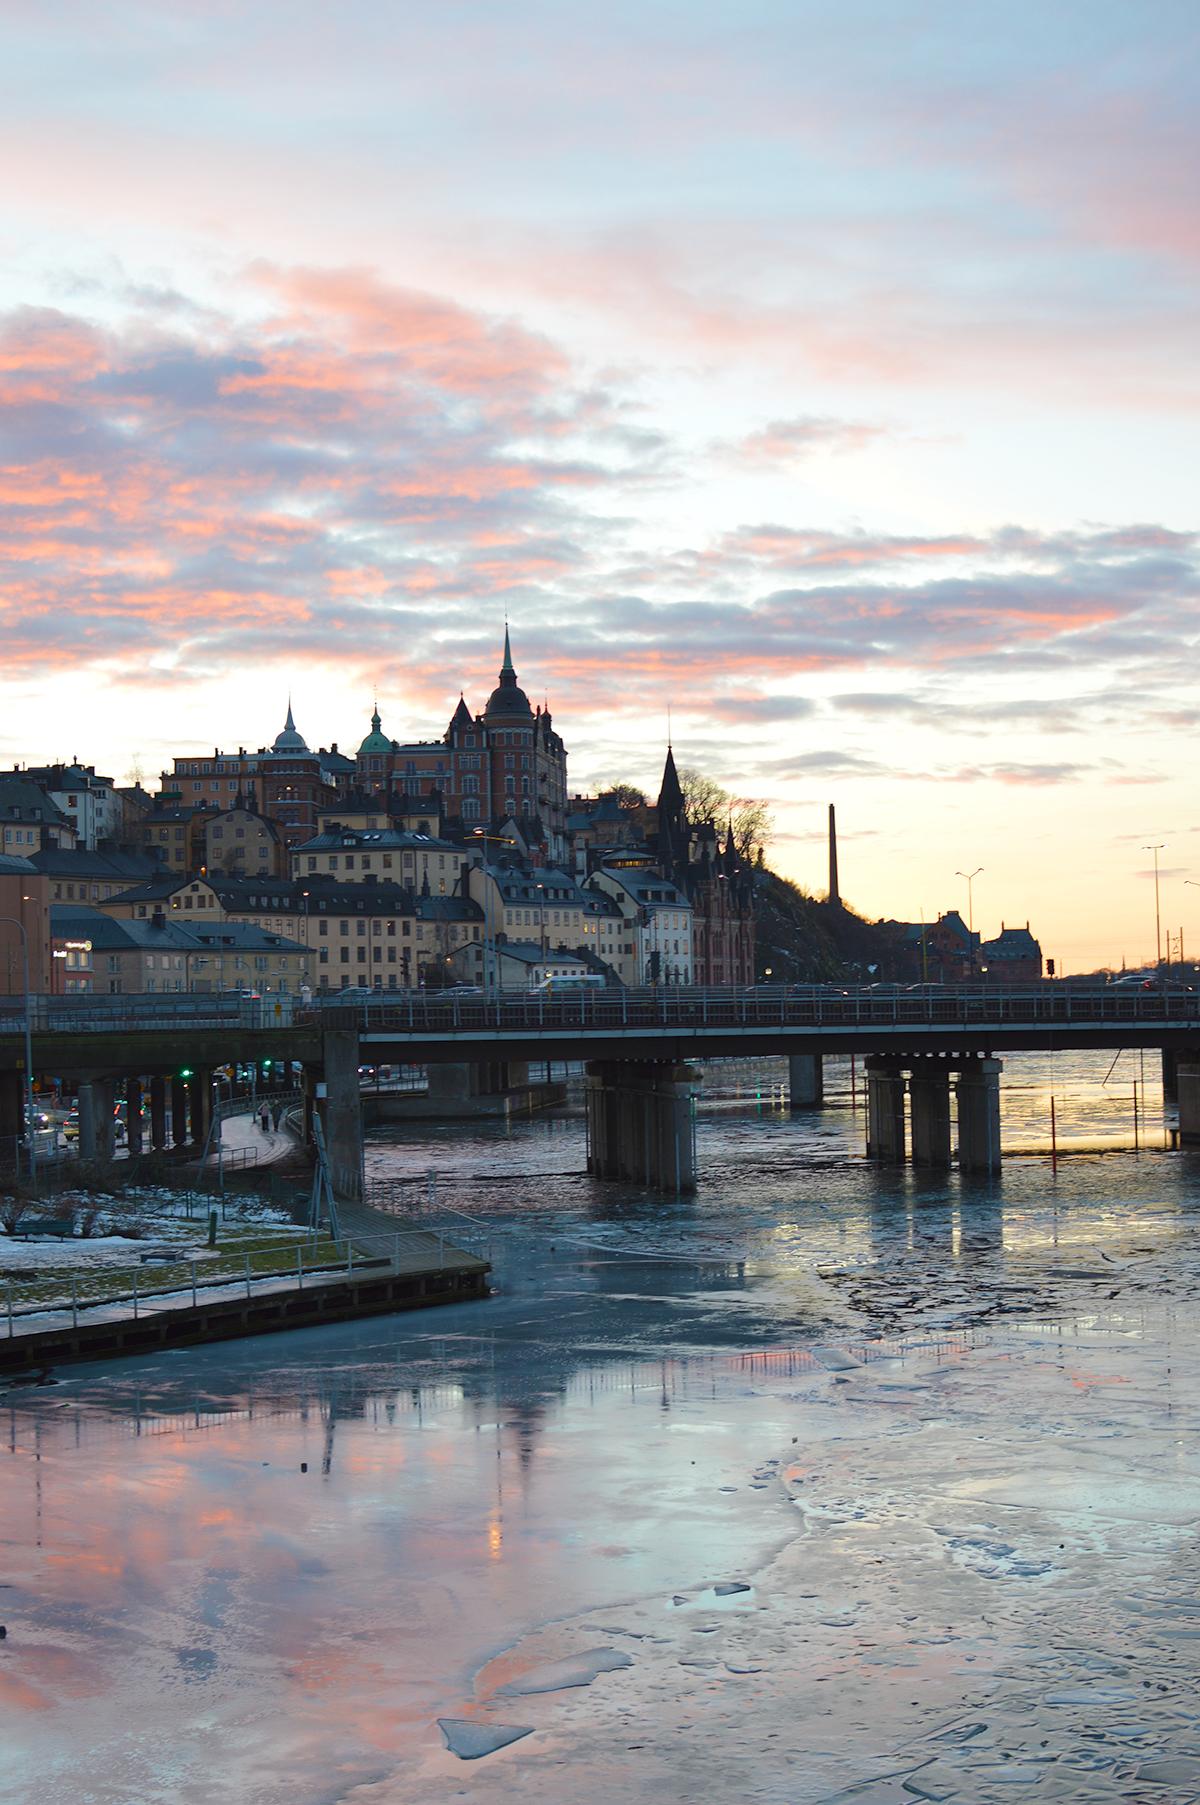 coucher-de-soleil-stockholm-gamla-stan-2